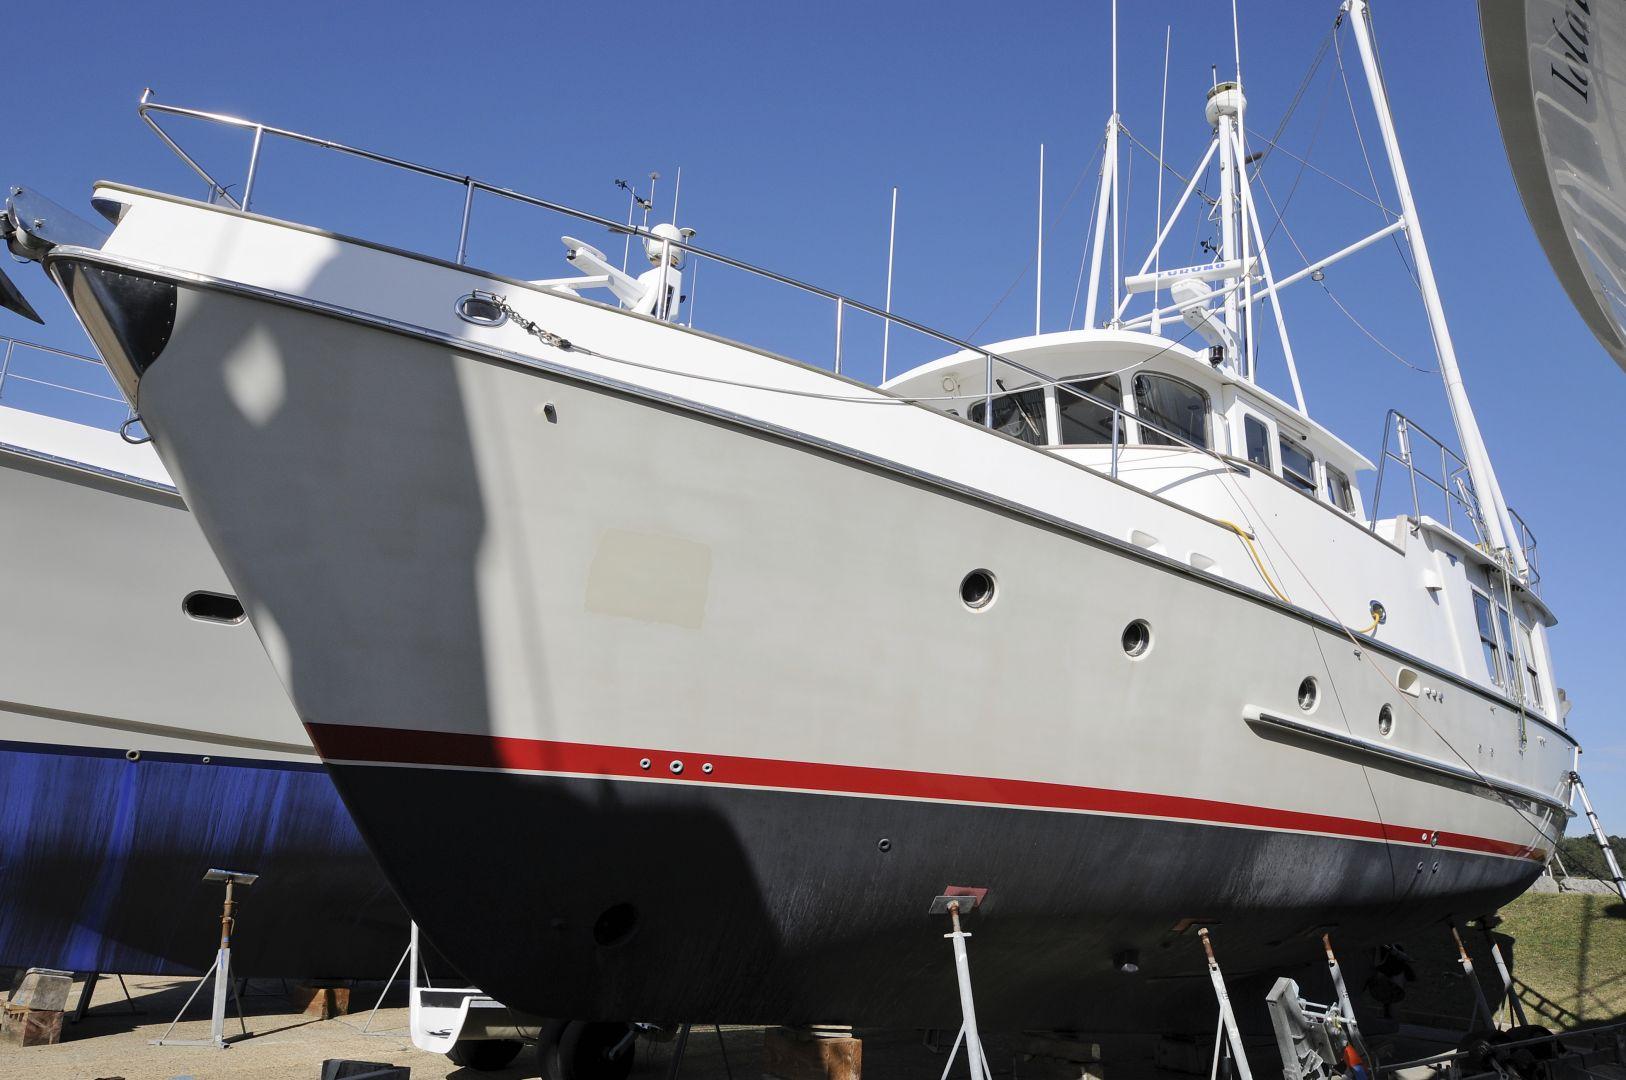 Nordhavn 46 - Swordfish